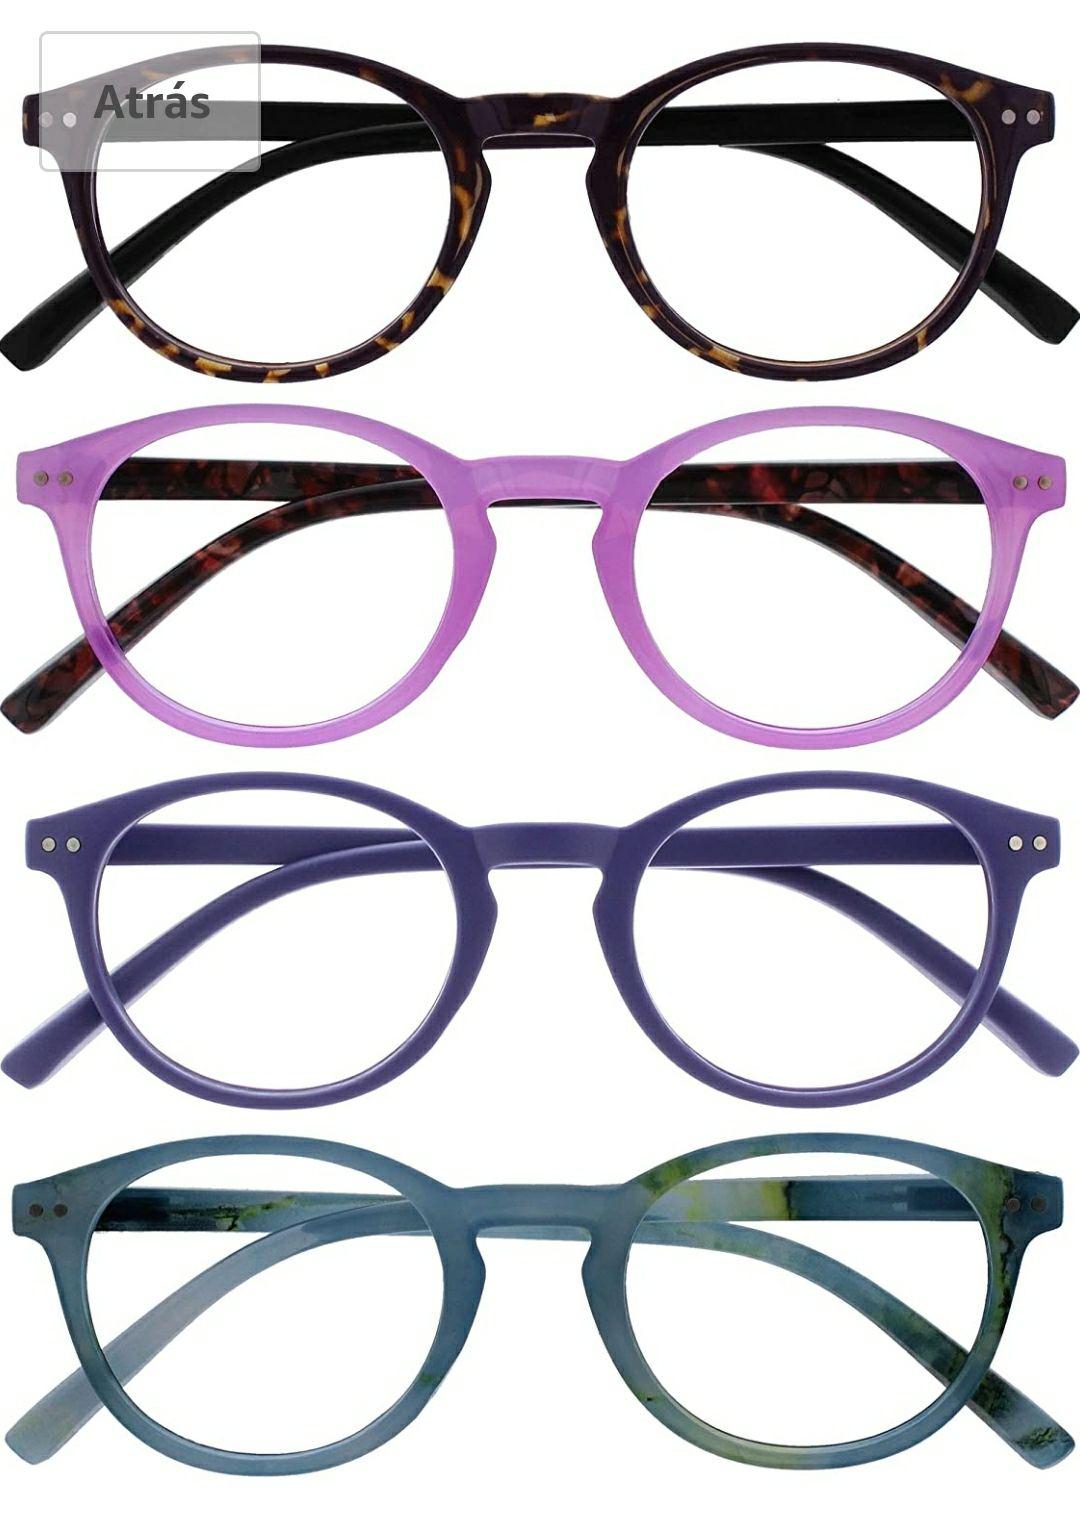 Opulize Zen Pack 4 Gafas De Lectura Oscuro Marrón Rosa Púrpura Turquoise Pequeño Hombres Mujeres RRRR24-245Q +2,00